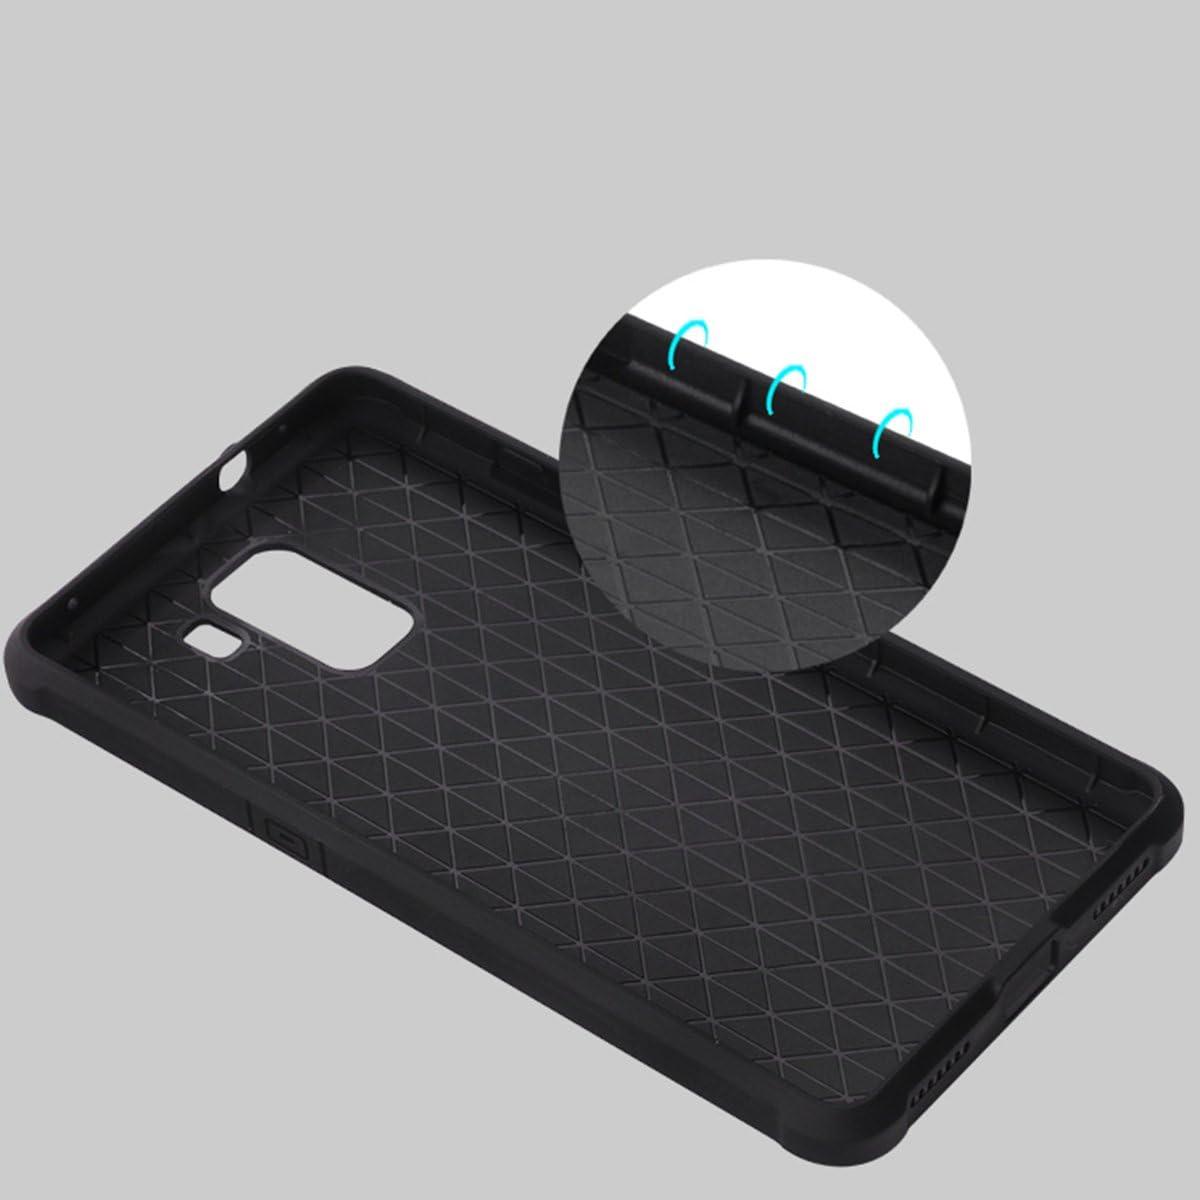 Lizimandu Huawei Honor 7 Cover, UltraSlim Protettiva Custodia Gel TPU Shock-Absorption Back Protector Cover Shockproof Custodia Case Tacsa Shell ...